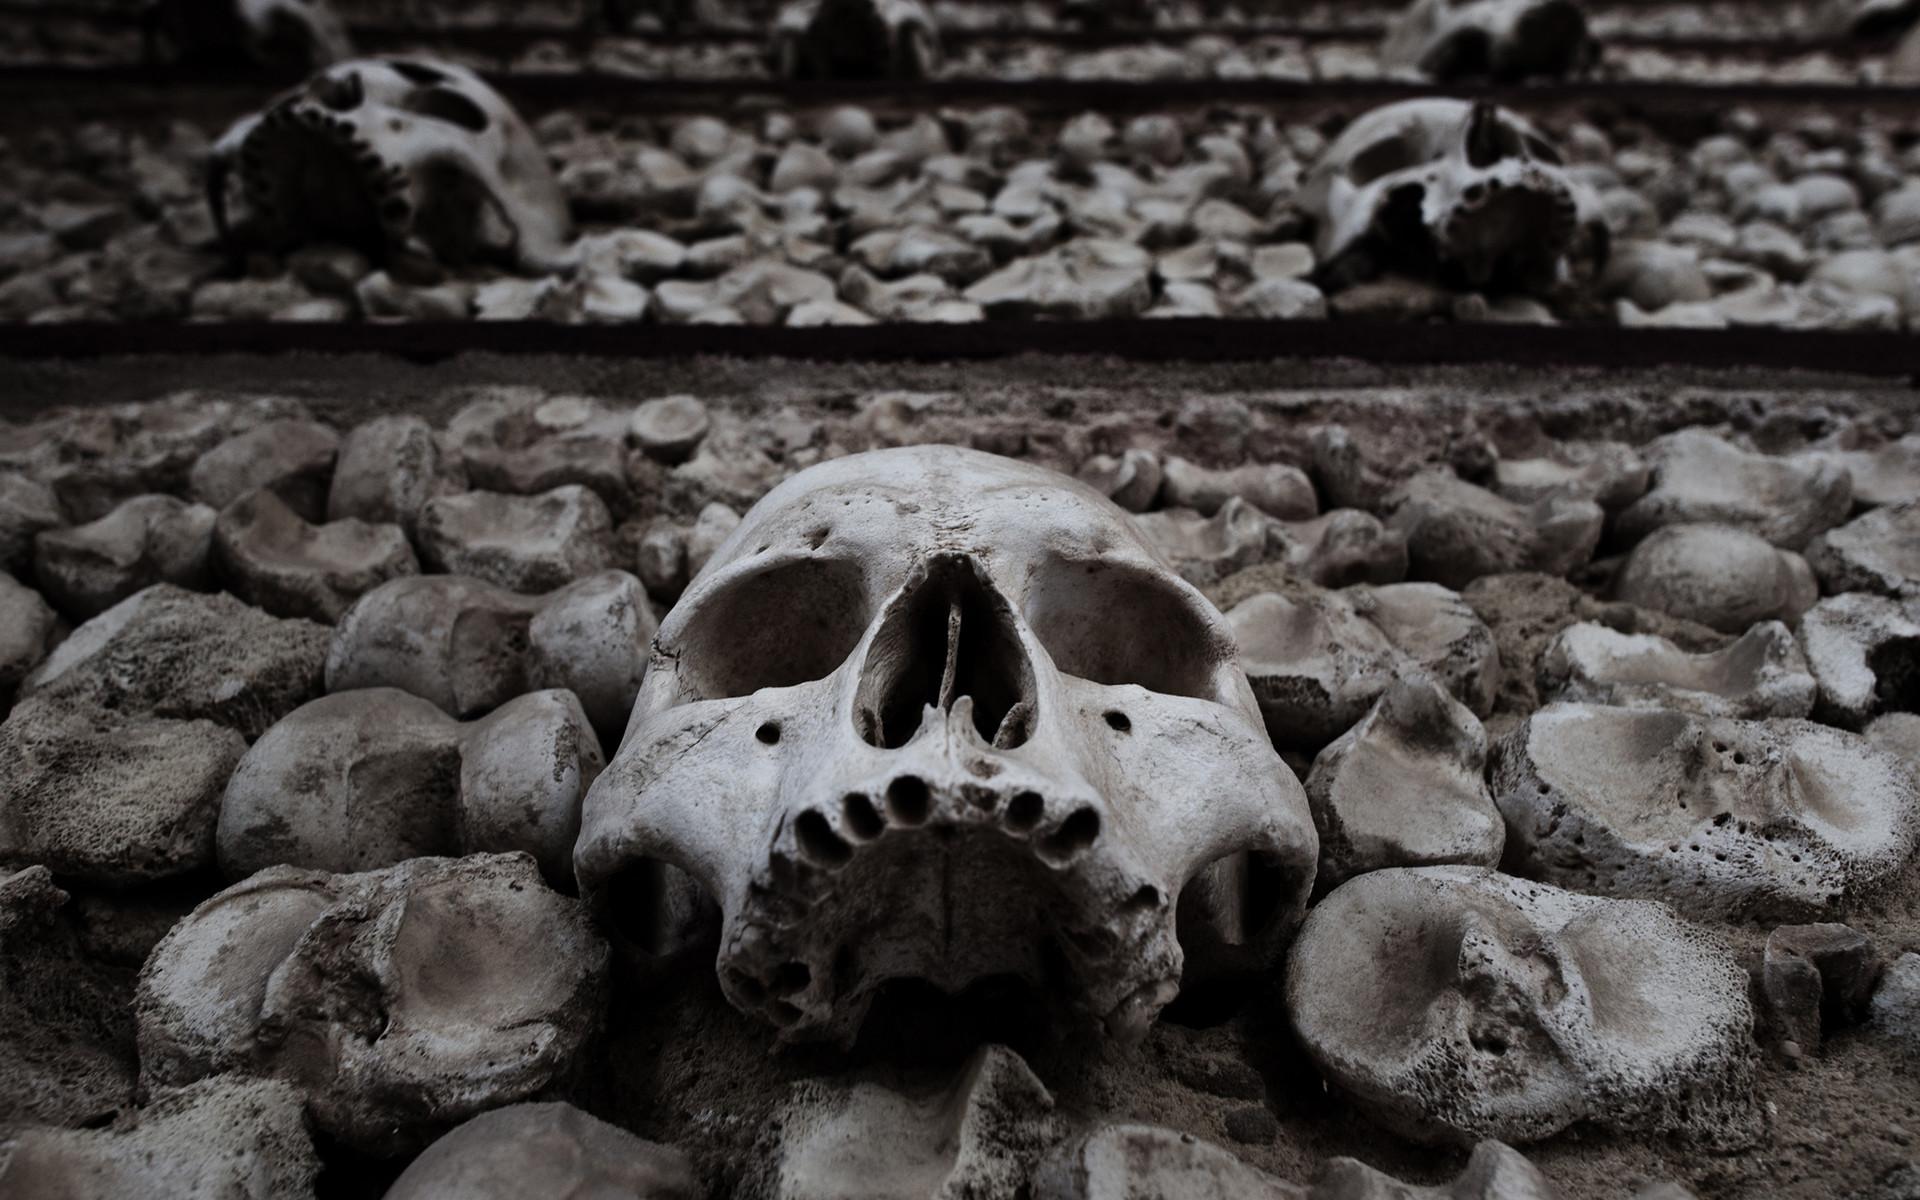 Dark fantasy death dead skulls skeleton halloween horror scary spooky creepy  black white eyes face wallpaper | | 26217 | WallpaperUP